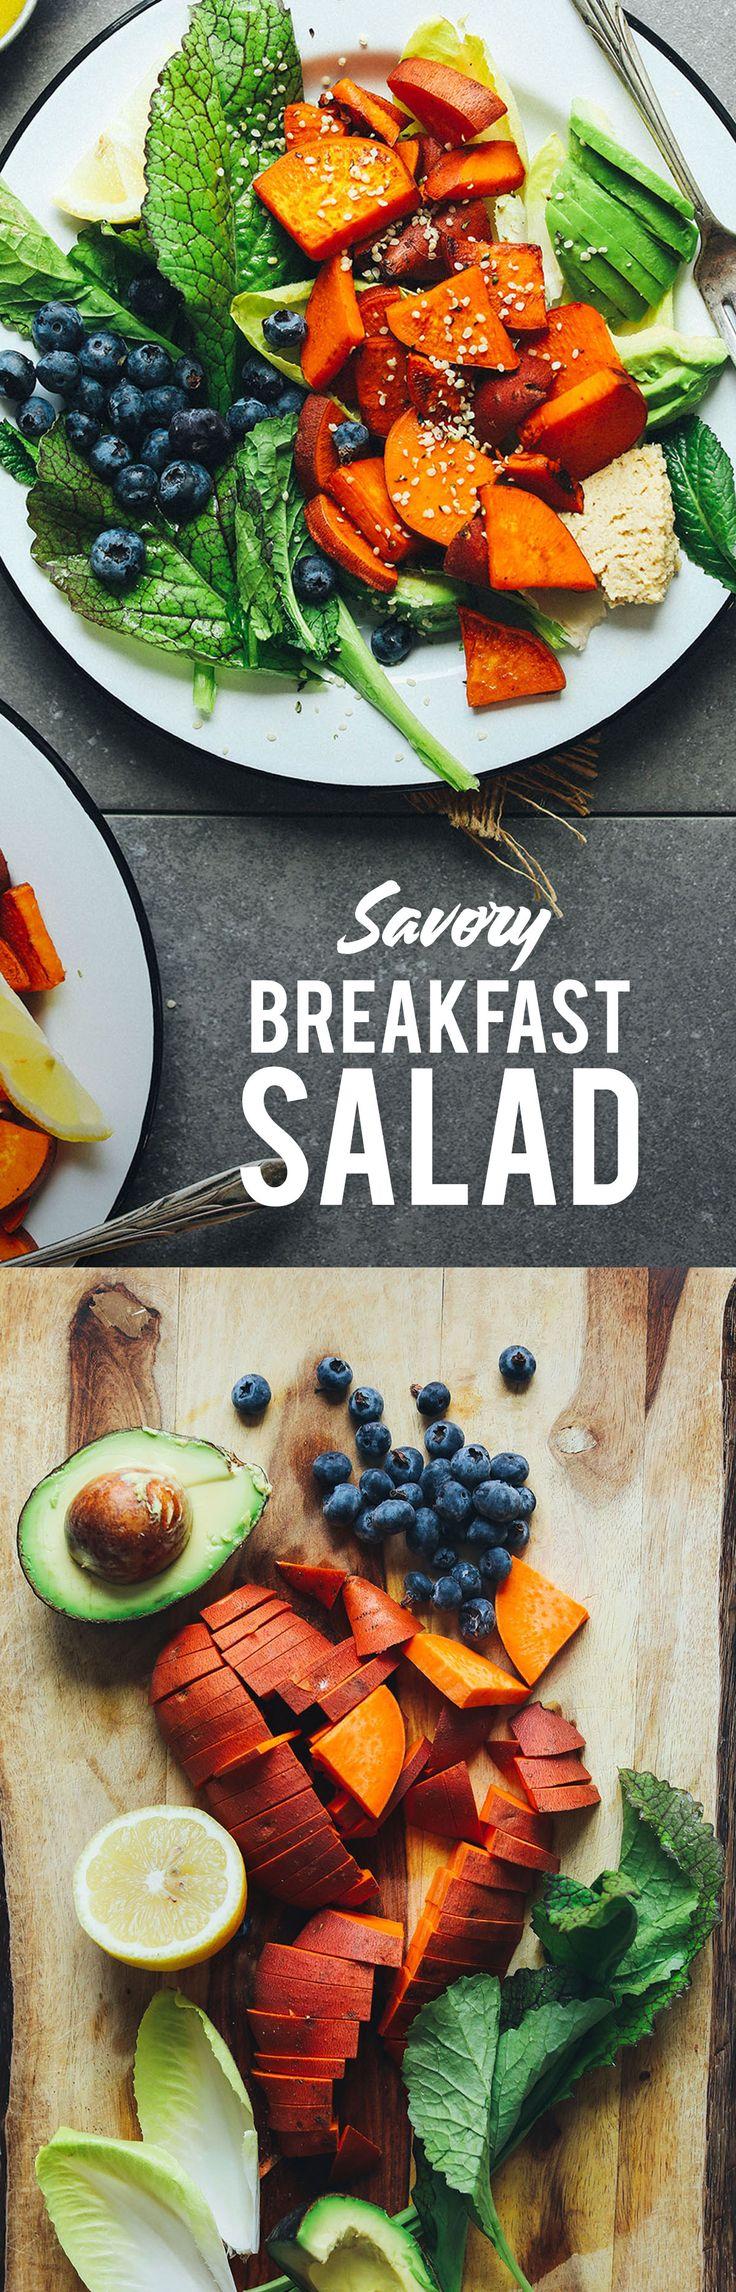 AMAZING Vegan Breakfast Salad! Lemony greens, sweet potatoes, blueberries, hummus, and hemp seeds! #vegan #plantbased #glutenfree #breakfast #recipe #minimalistbaker